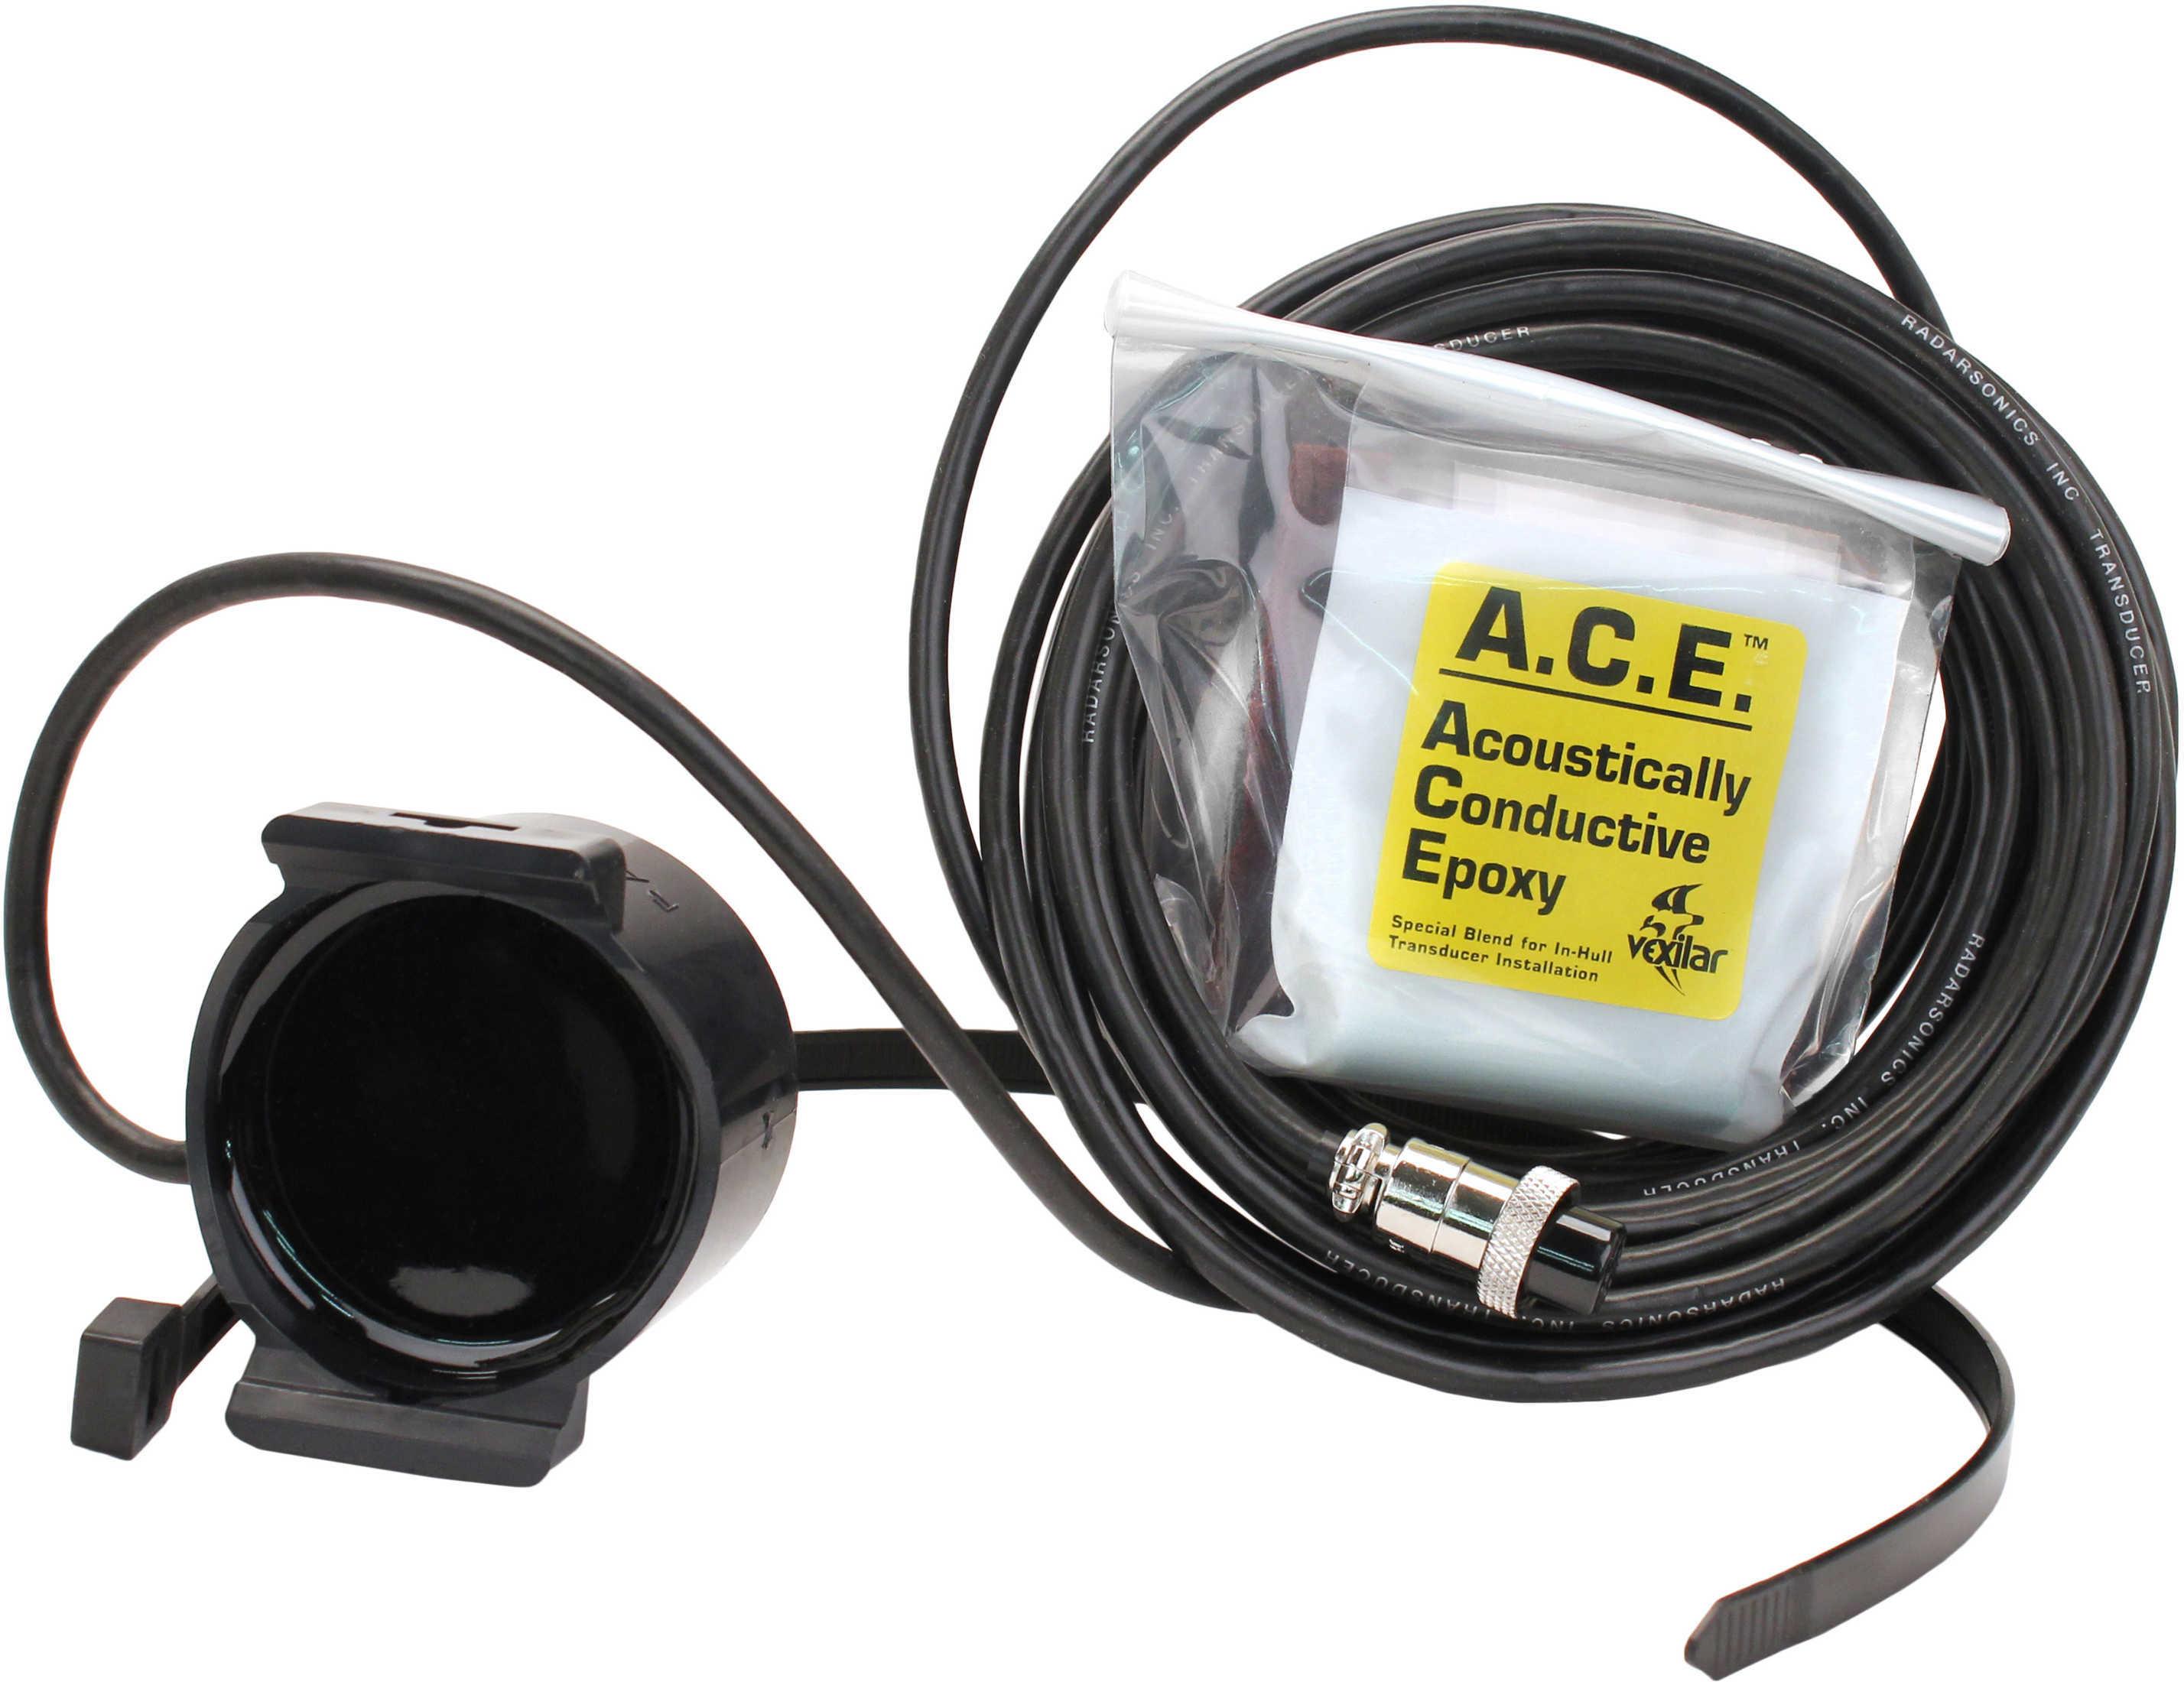 Vexilar Inc. 12° Puck Transducer (all FL units)-25' TB0087